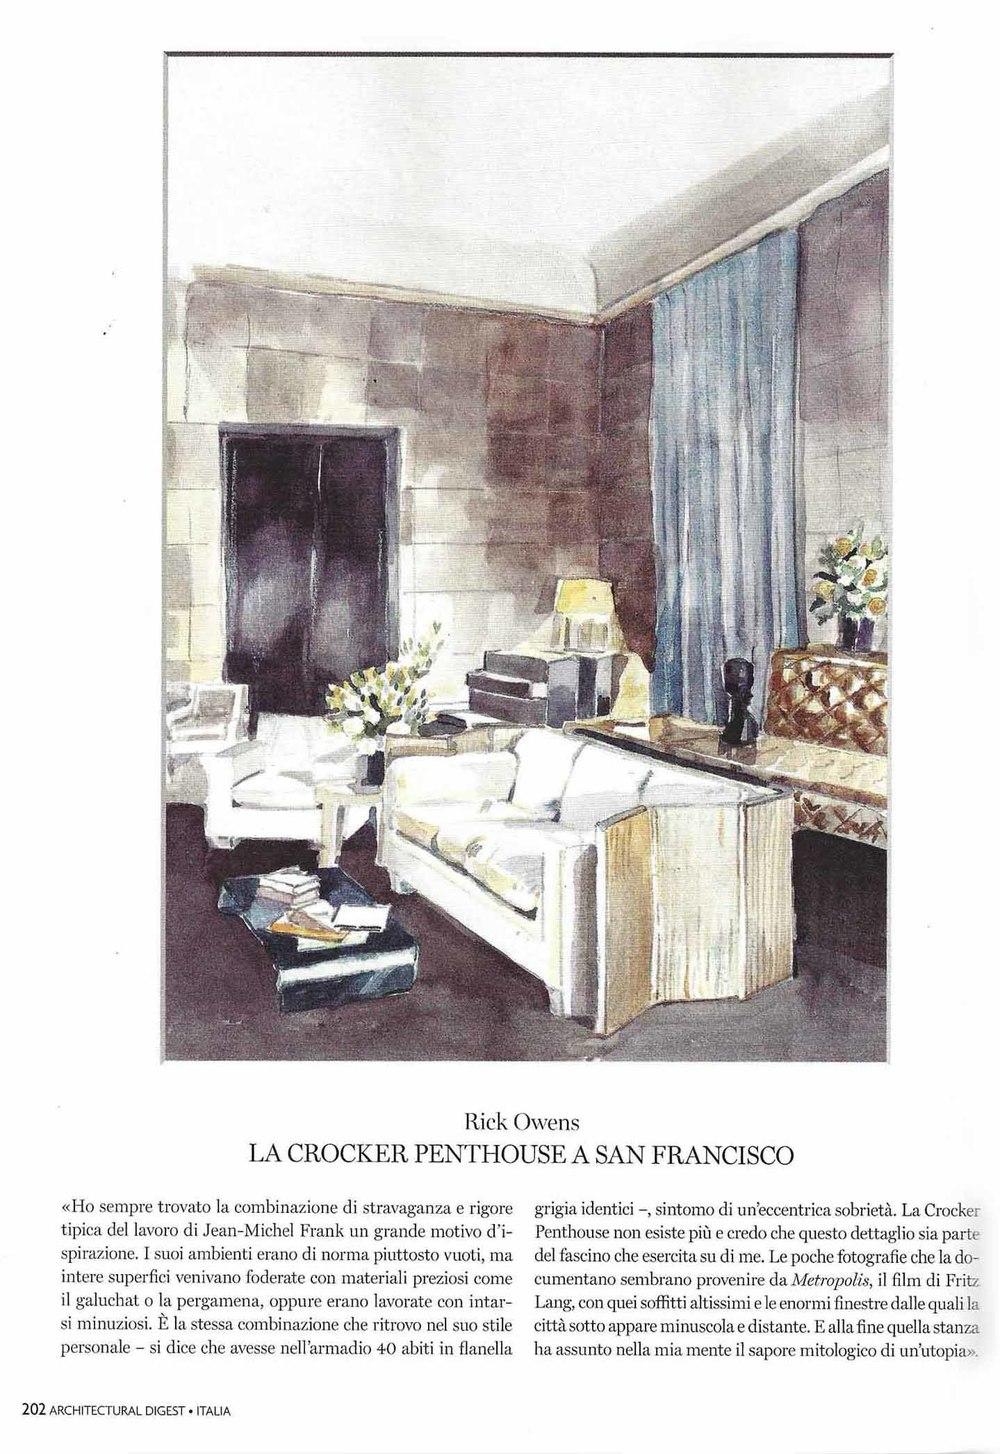 Rick Owens - Crocker Penthouse